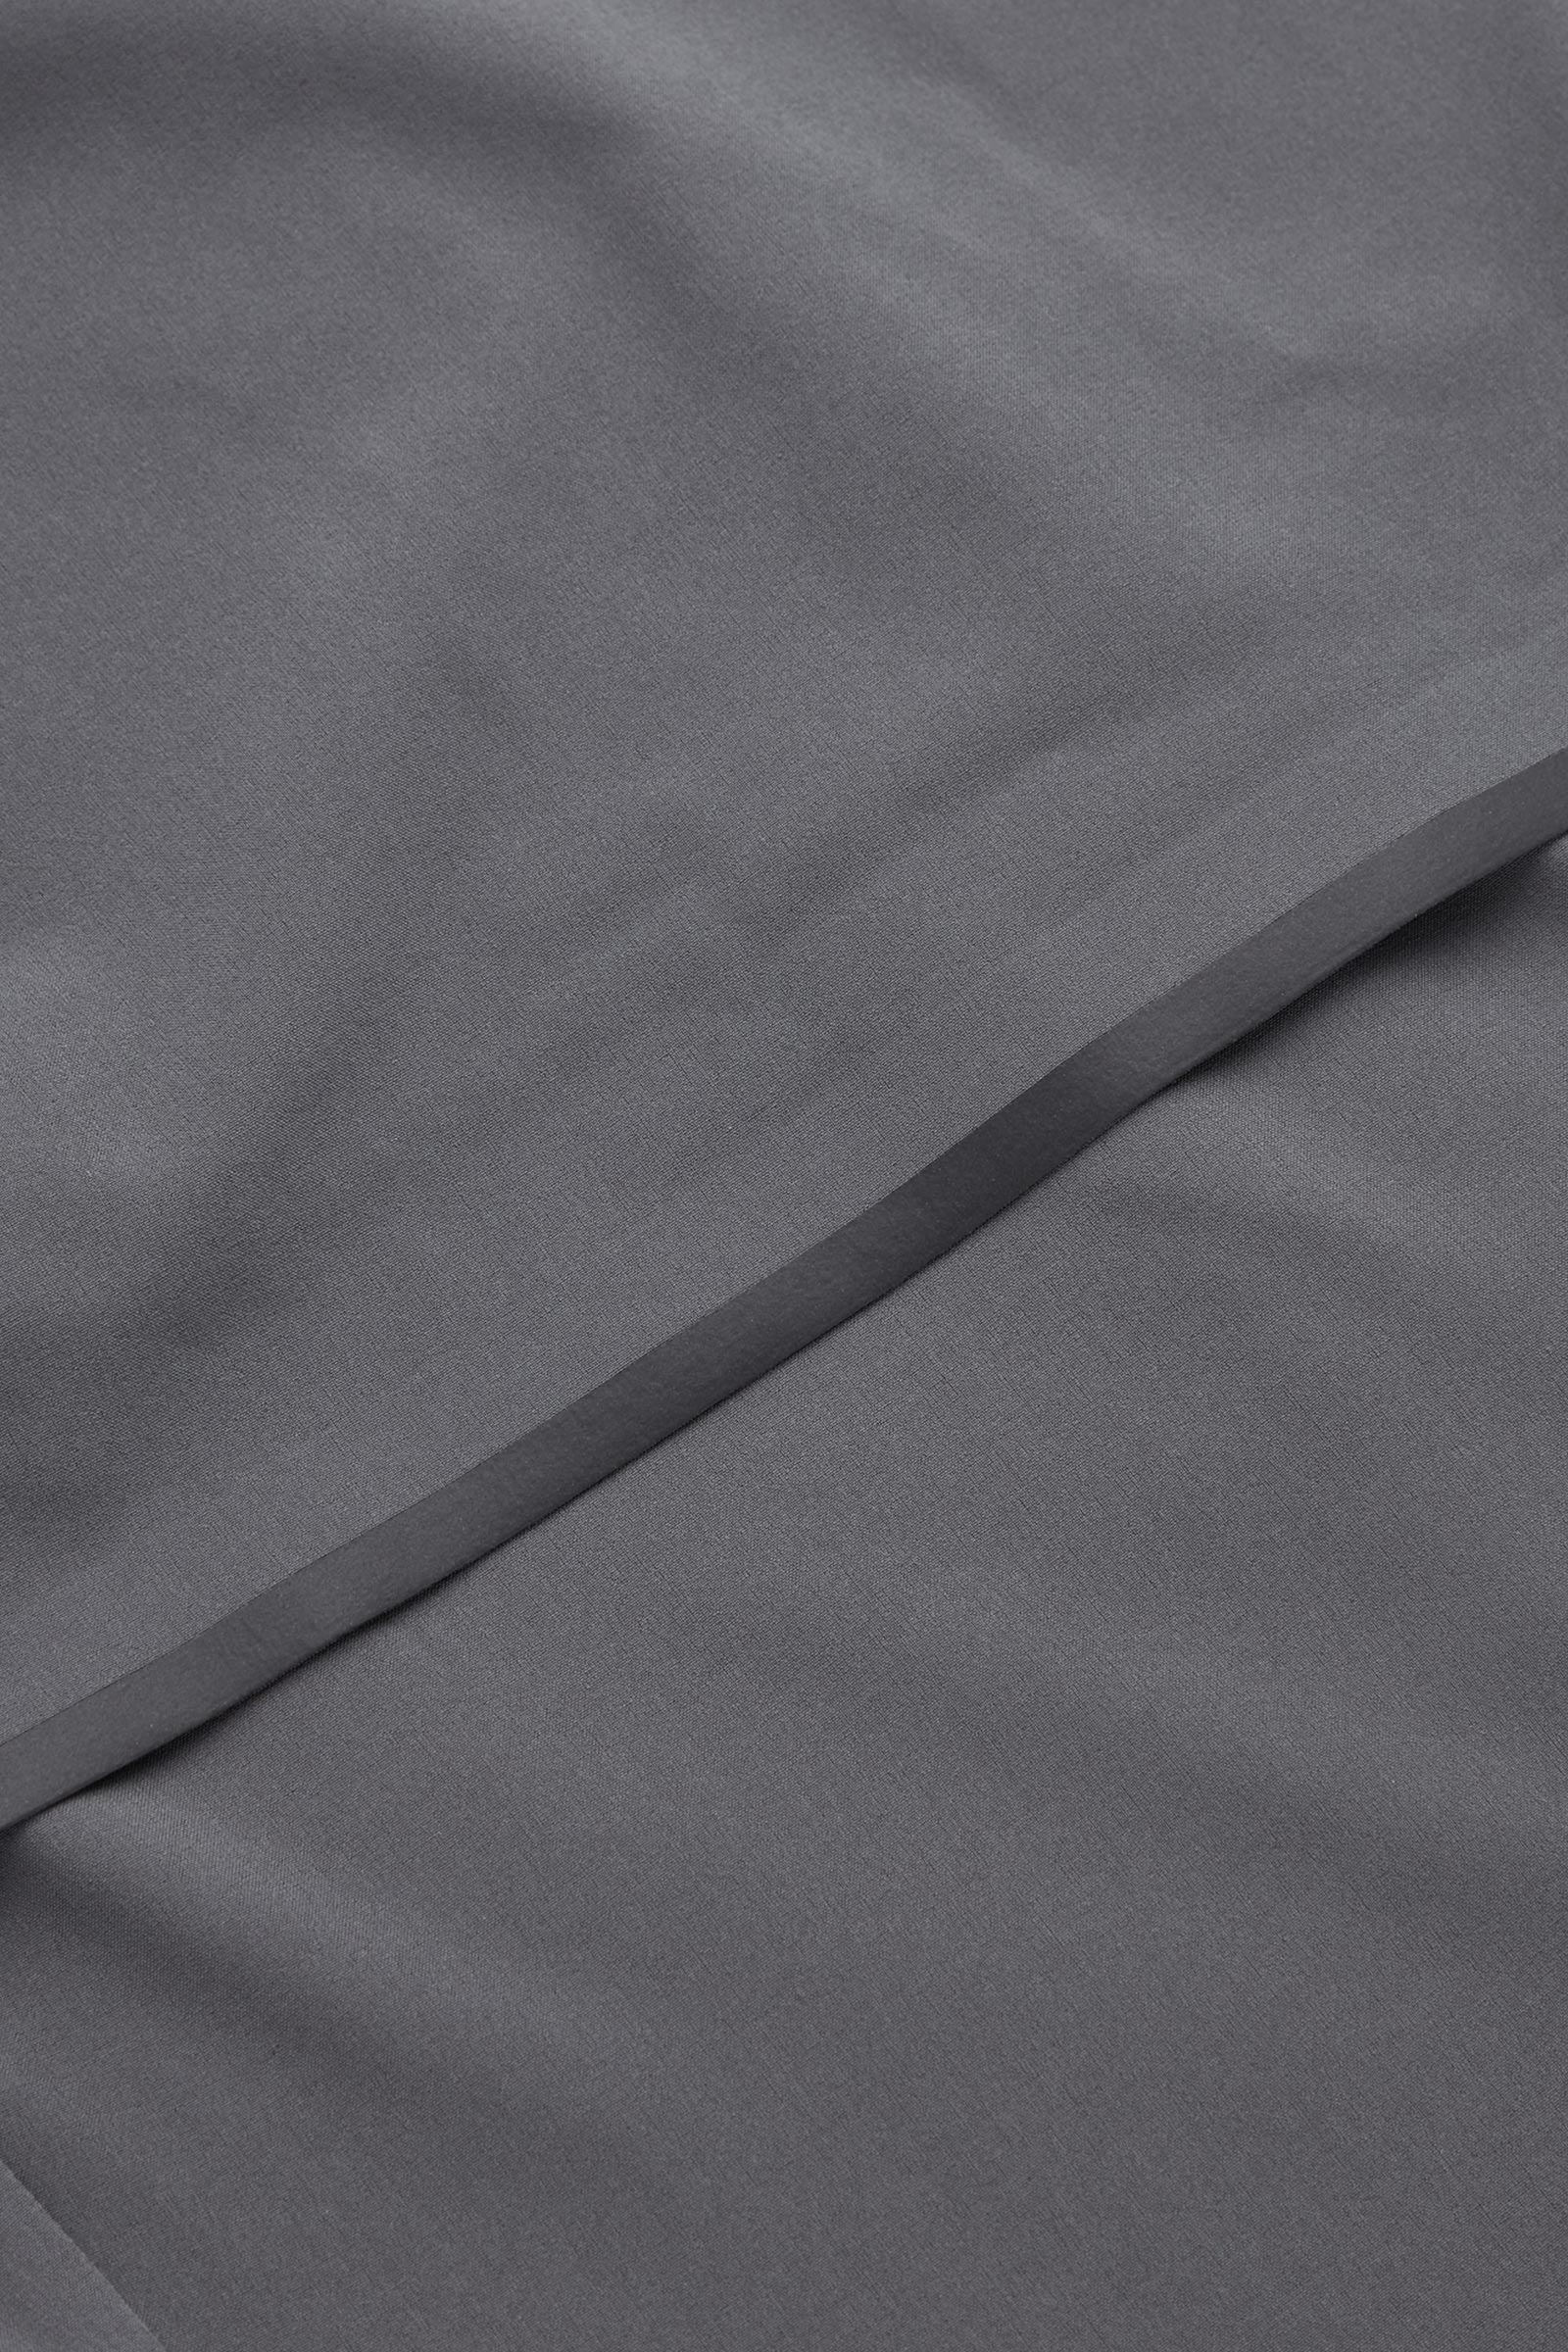 COS 퍼포먼스 러닝 재킷의 다크 그레이컬러 Detail입니다.